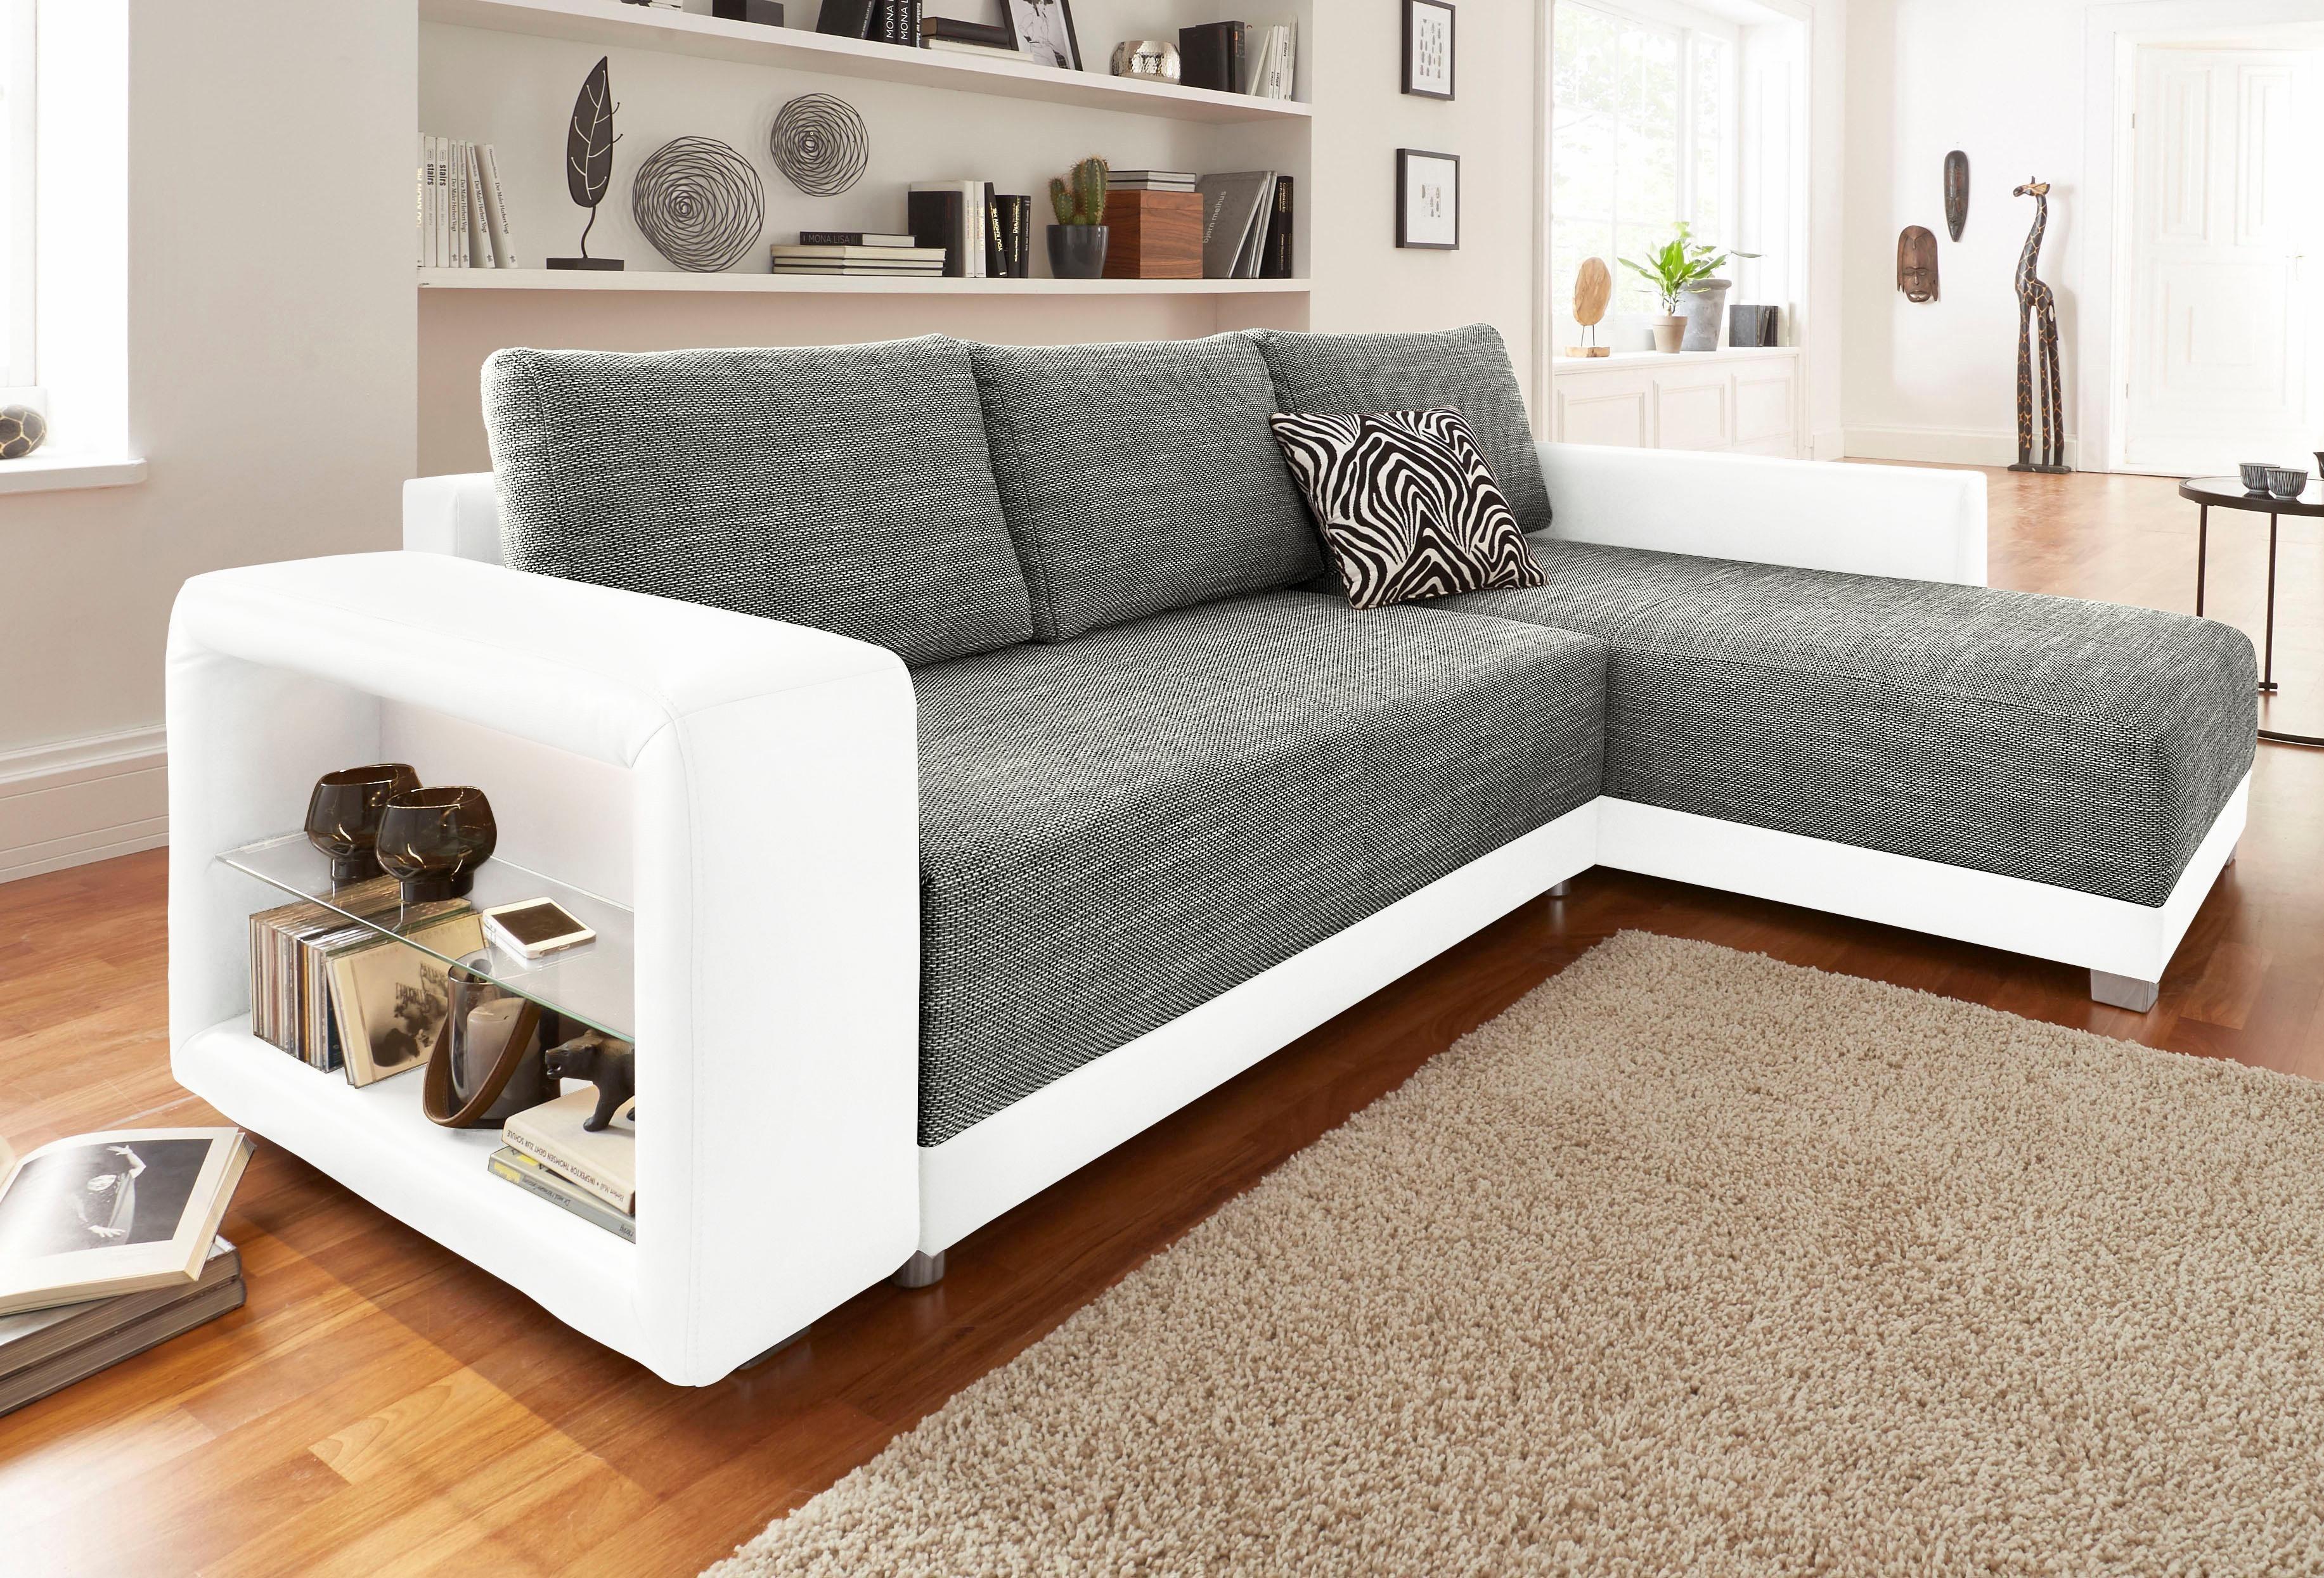 sit more polsterecke inkl led beleuchtung wahlweise mit bettfunktion wei online kaufen bei woonio. Black Bedroom Furniture Sets. Home Design Ideas